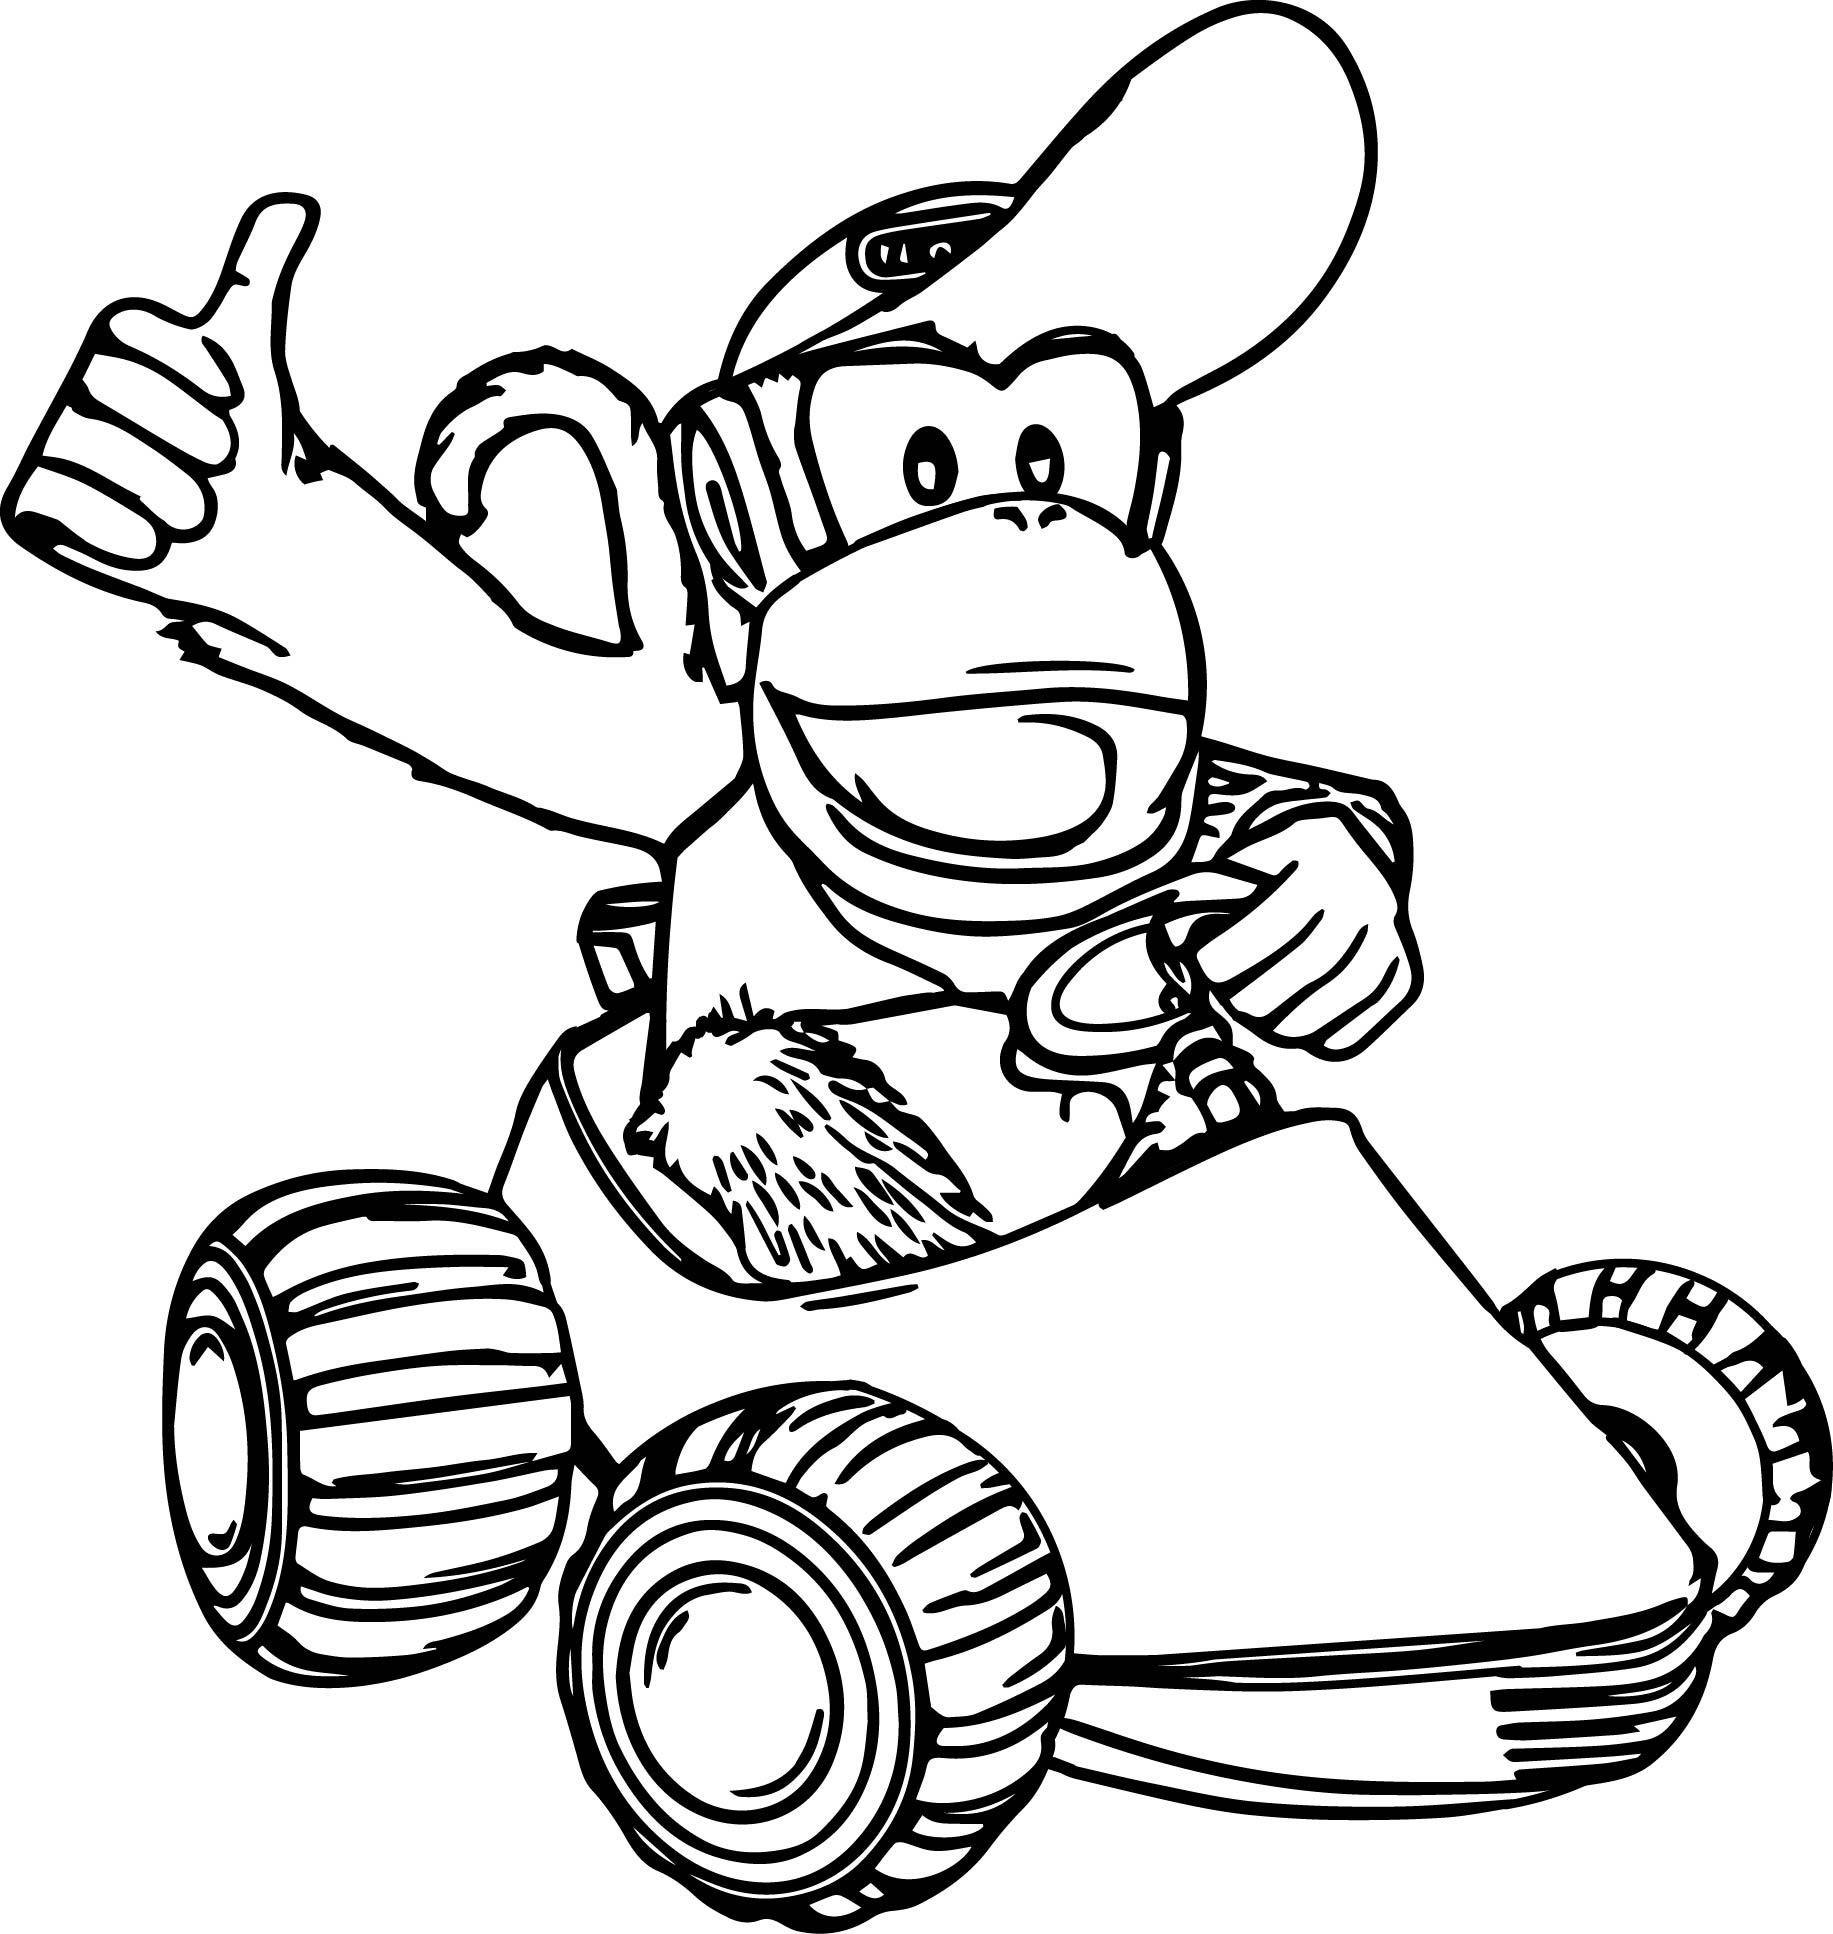 Donkey Kong Ausmalbilder Einzigartig Ausmalbild Baby Yoshi Best Donkey Kong Ausmalbilder Das Bild